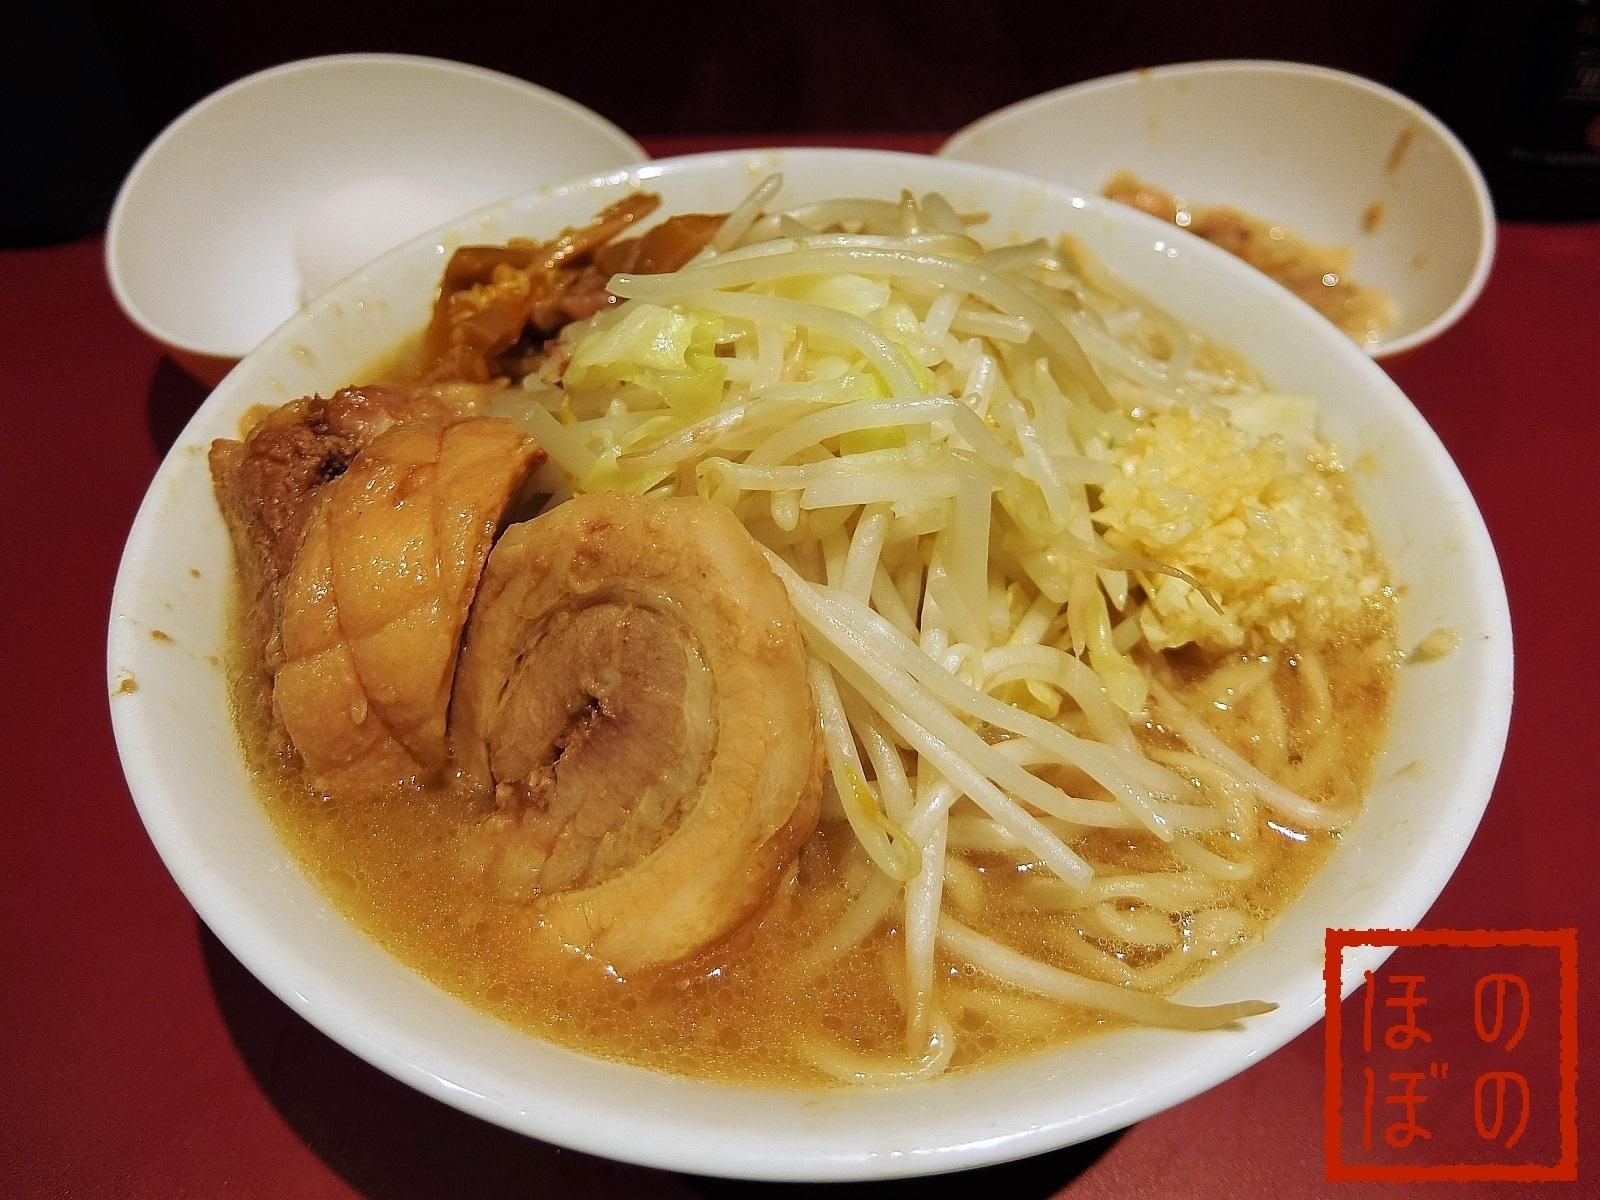 ogikubo-jirou43.jpg